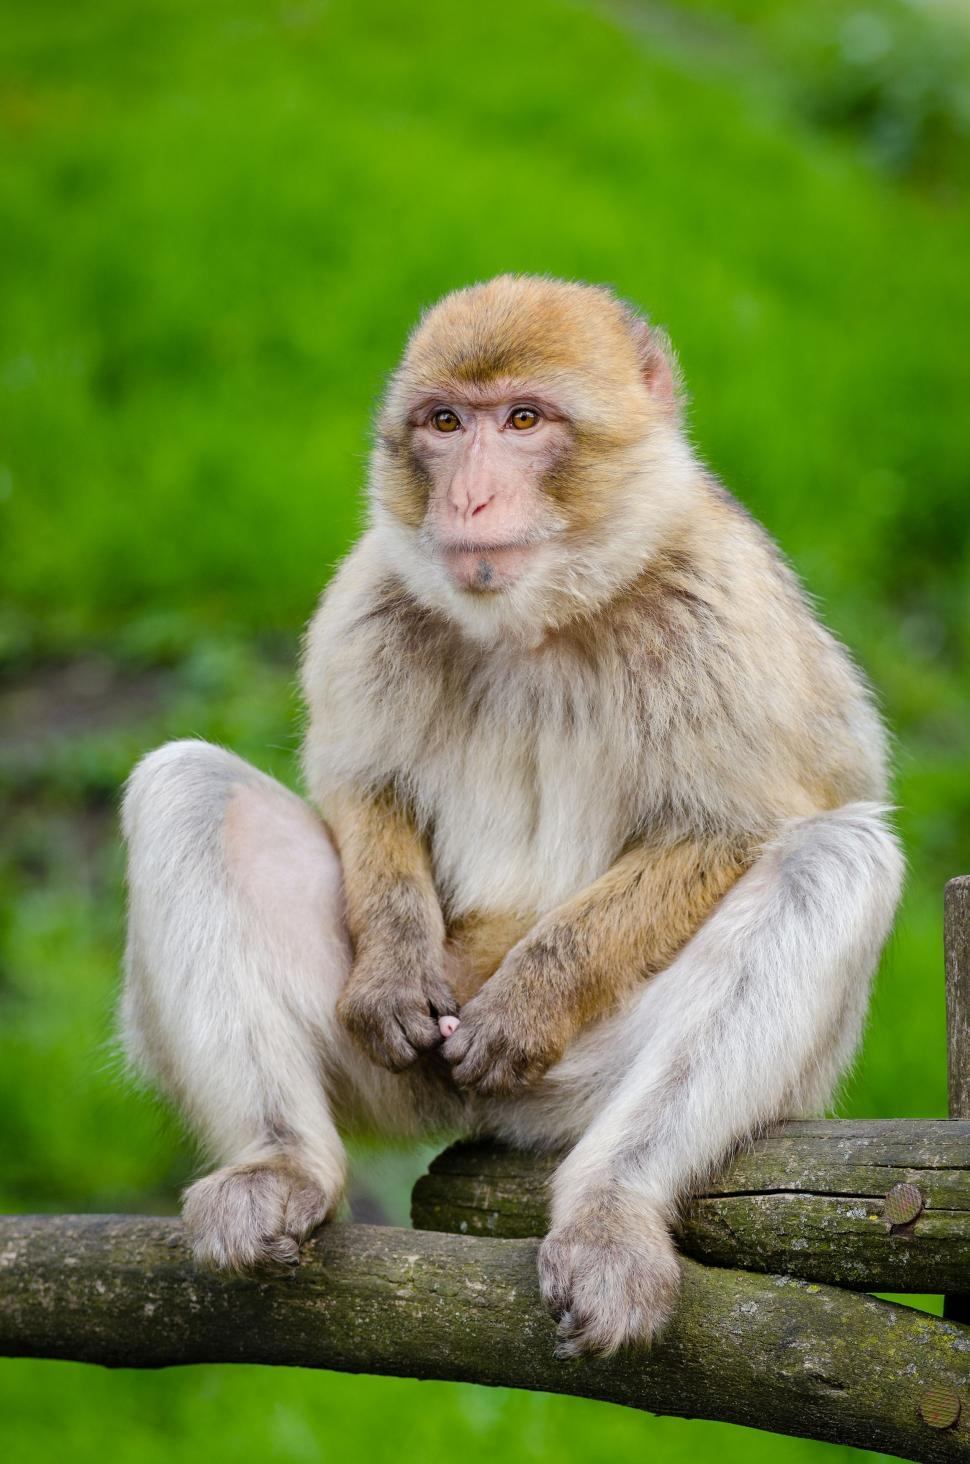 Download Free Stock Photo of Single Monkey